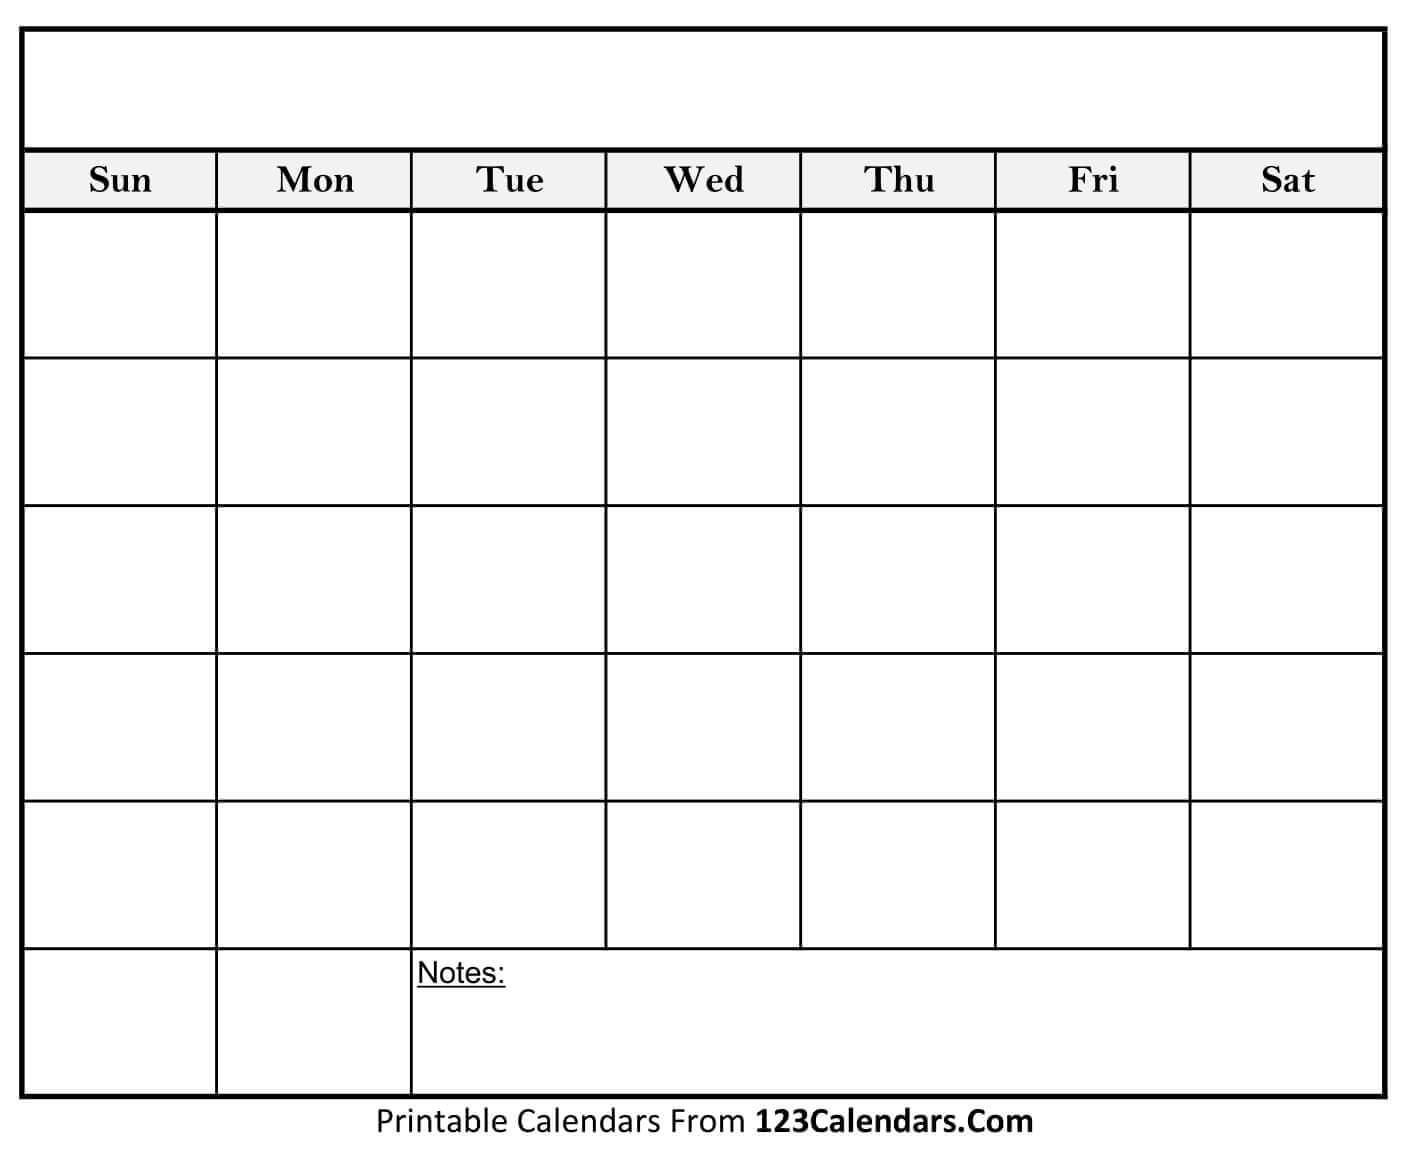 Free Printable Blank Calendar | 123Calendars with regard to Blank Calander Template